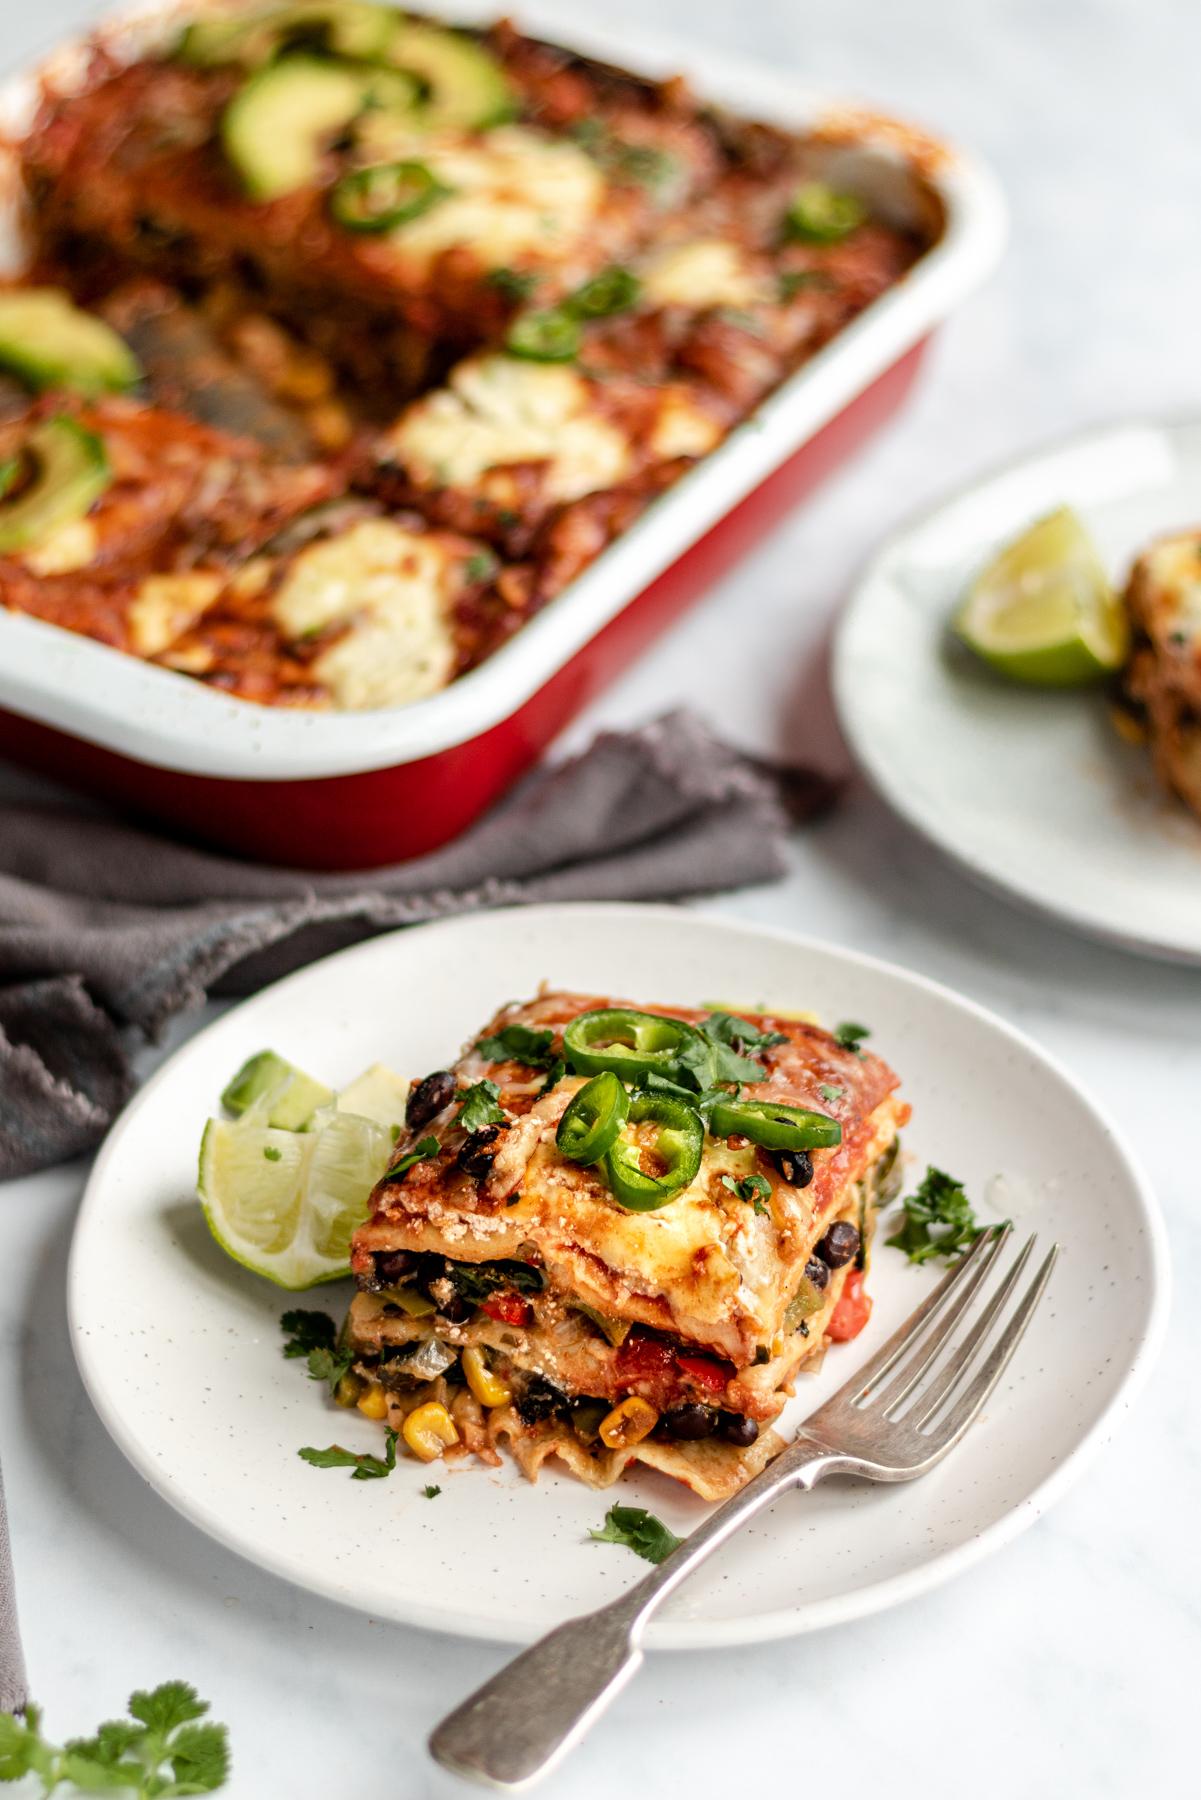 veggie enchilada casserole with black beans